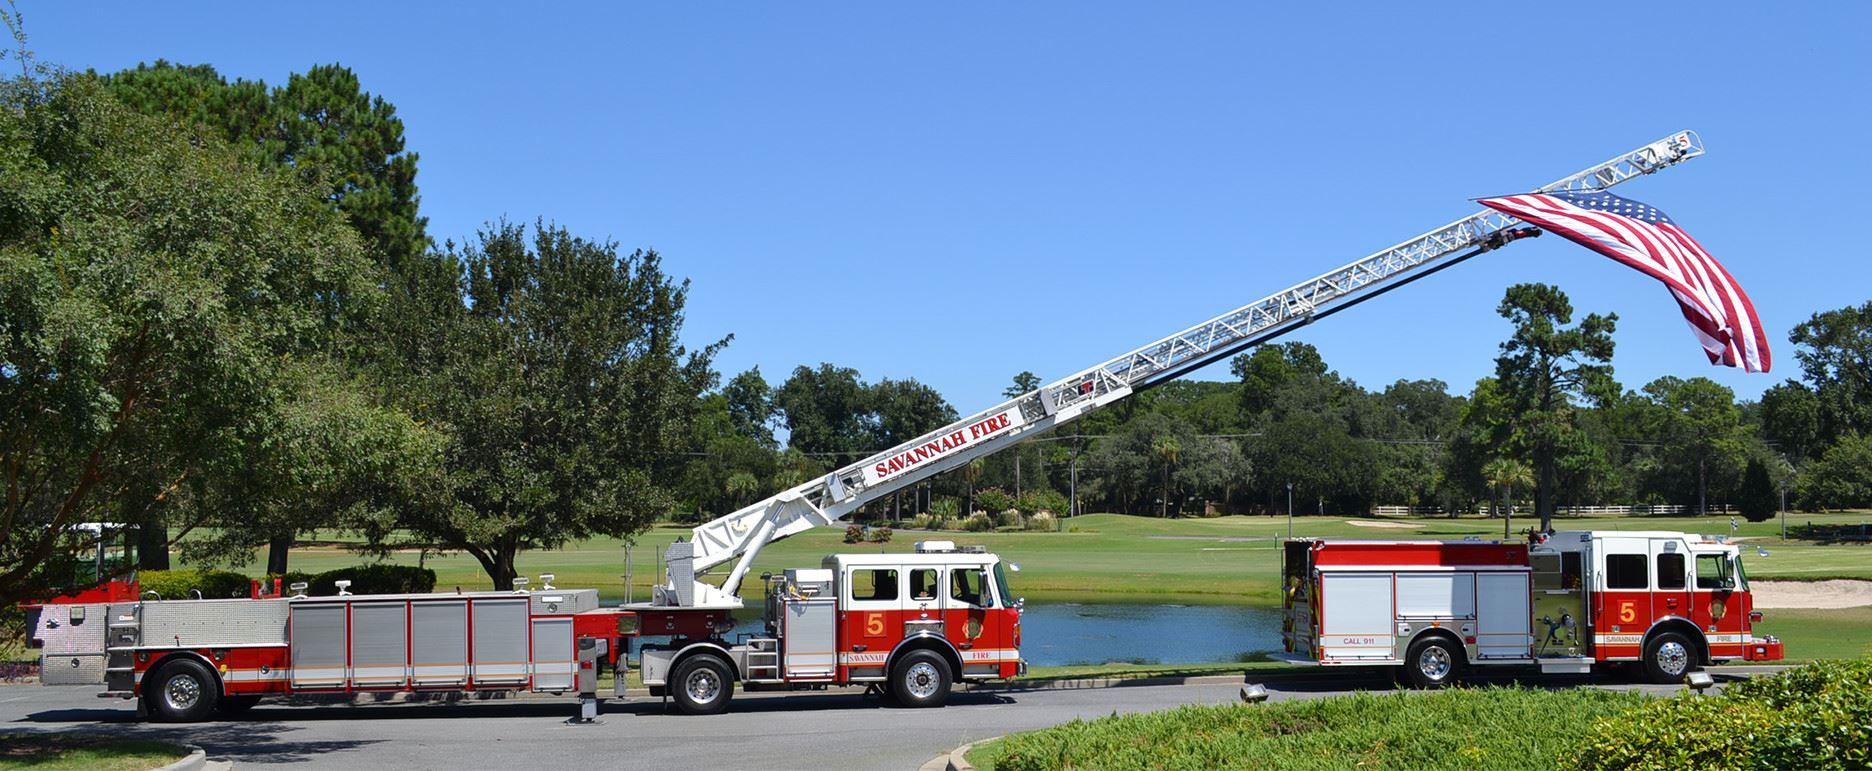 Savannah Fire & Emergency Services   Savannah, GA - Official Website